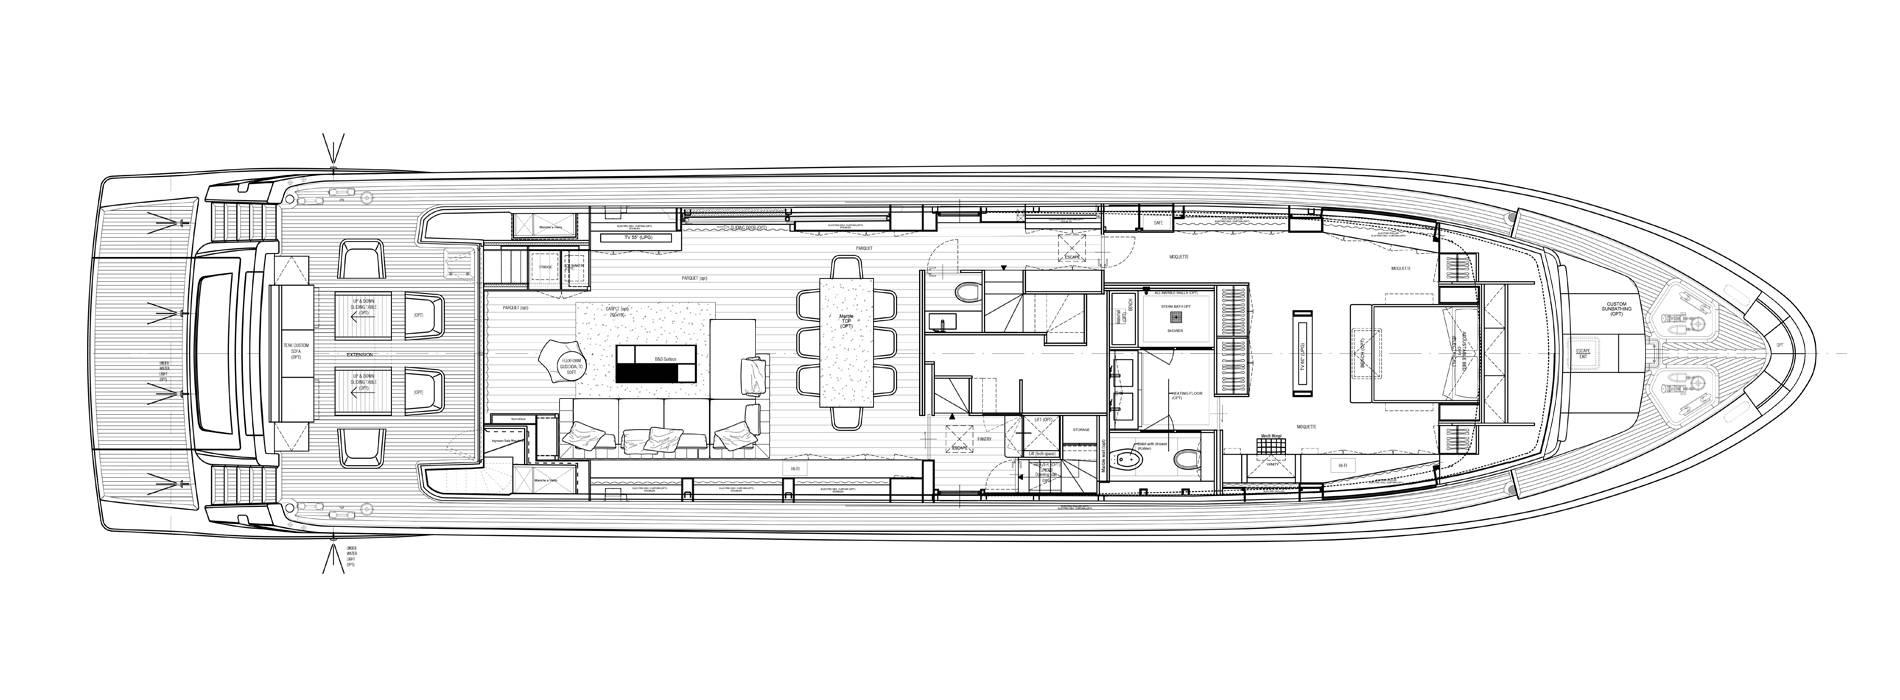 Sanlorenzo Yachts SL106-725 Main Deck